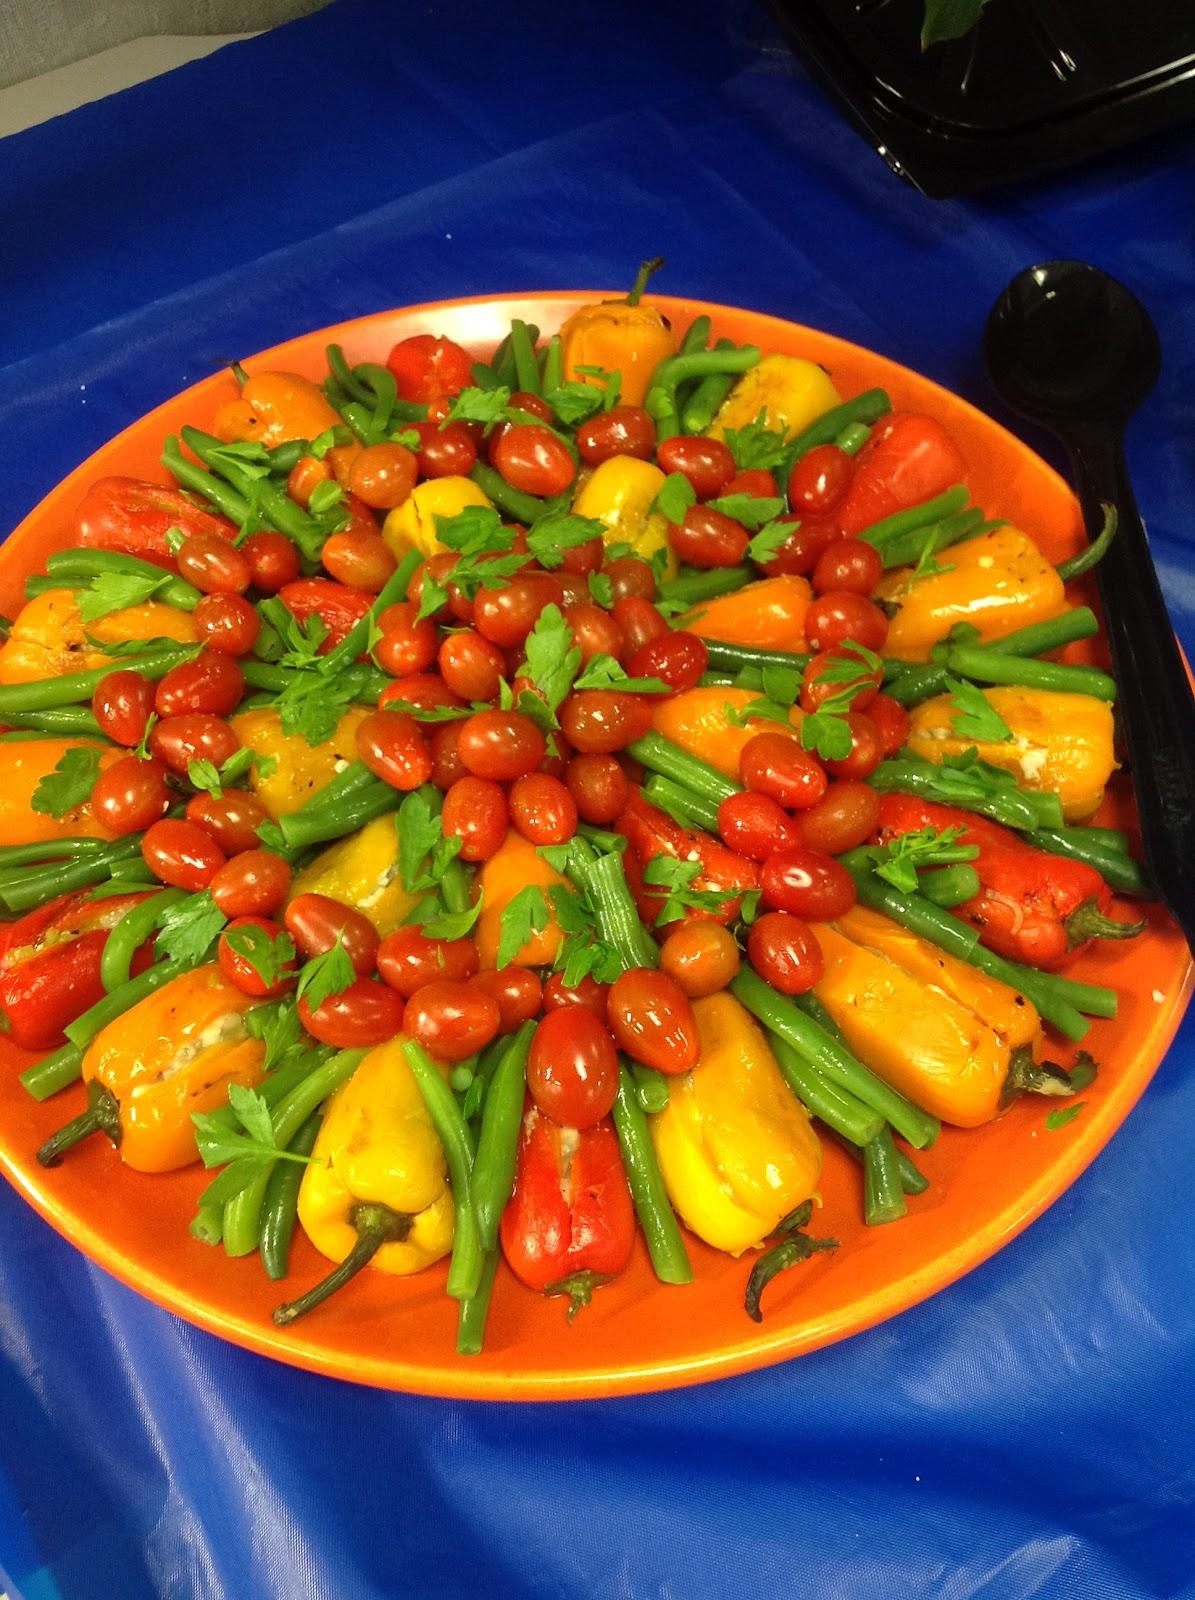 Prieta's Notes: The Tomato / El Tomate